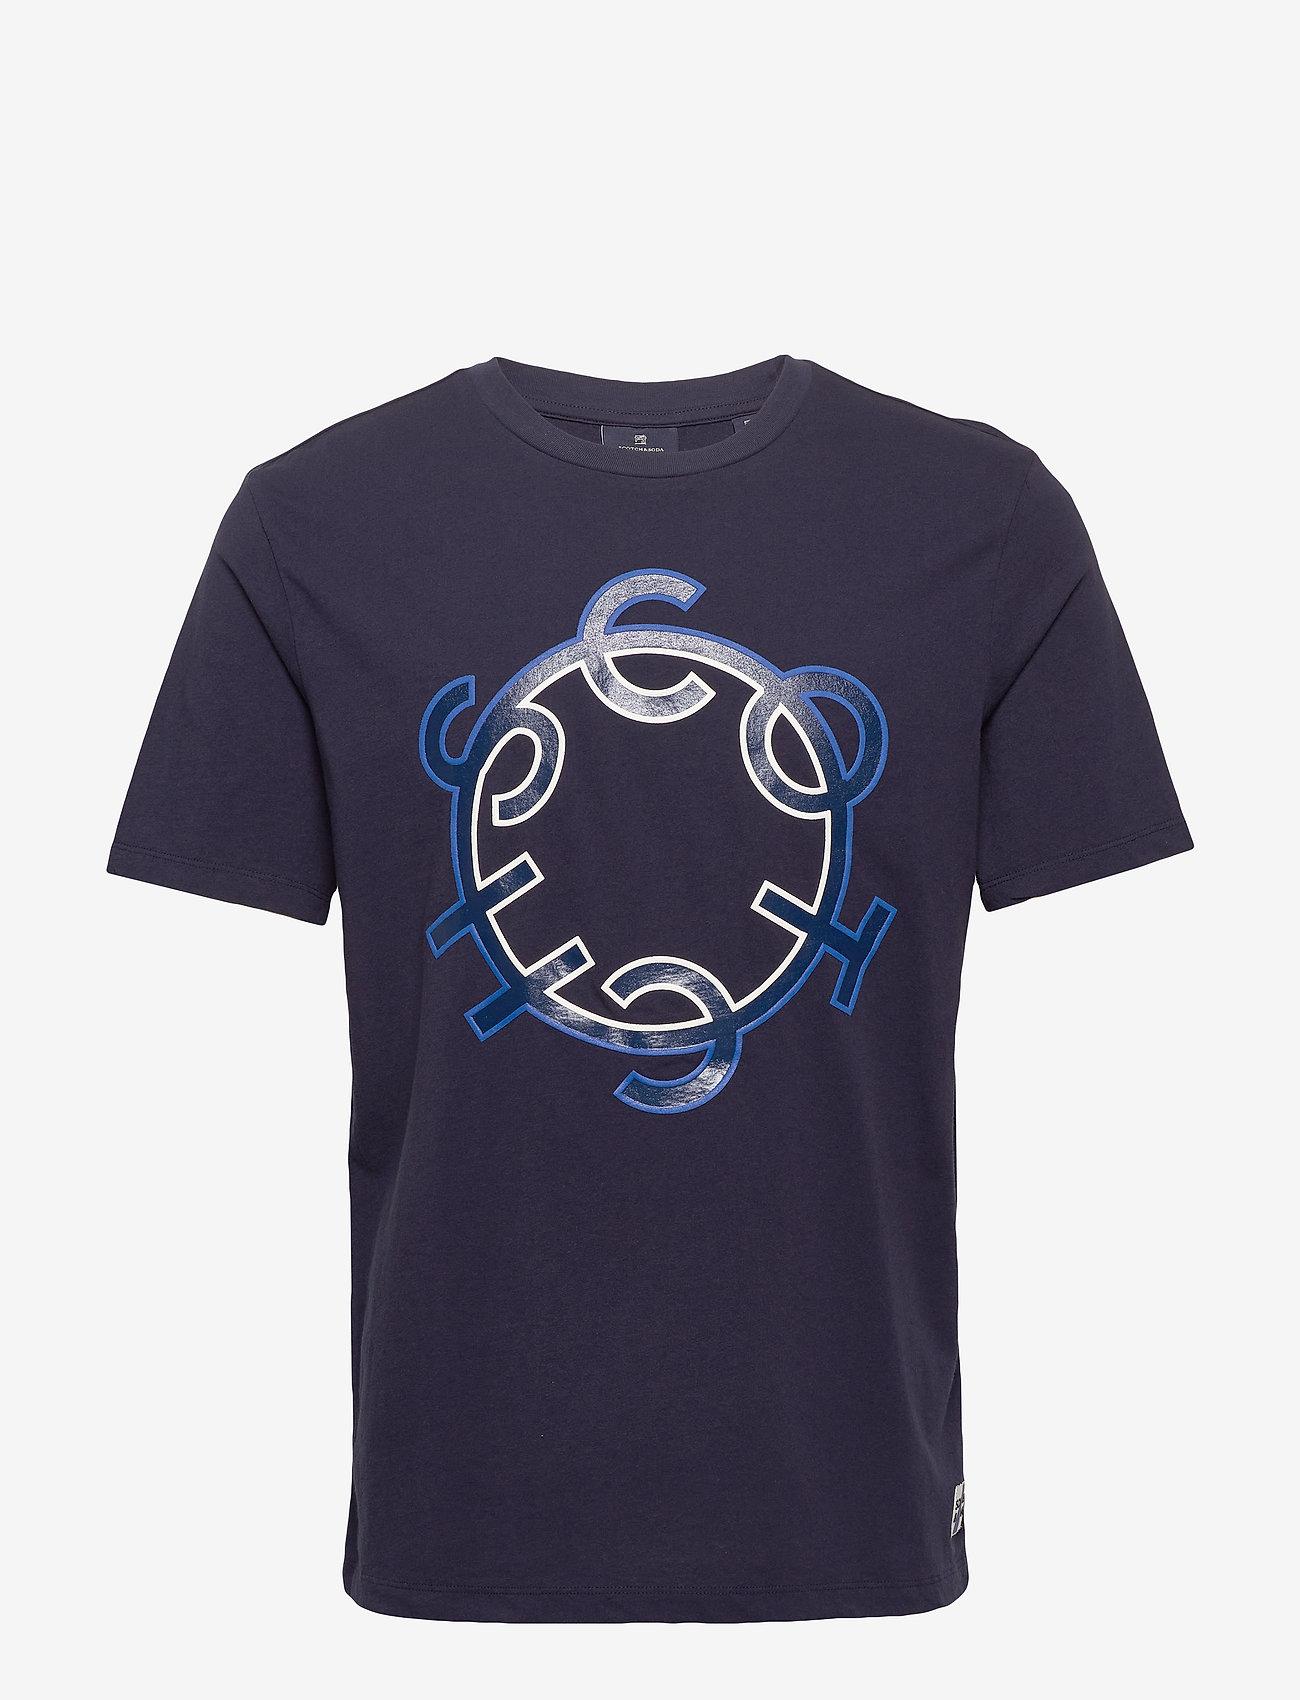 Scotch & Soda - Scotch & Soda crew neck logo tee - short-sleeved t-shirts - night - 0